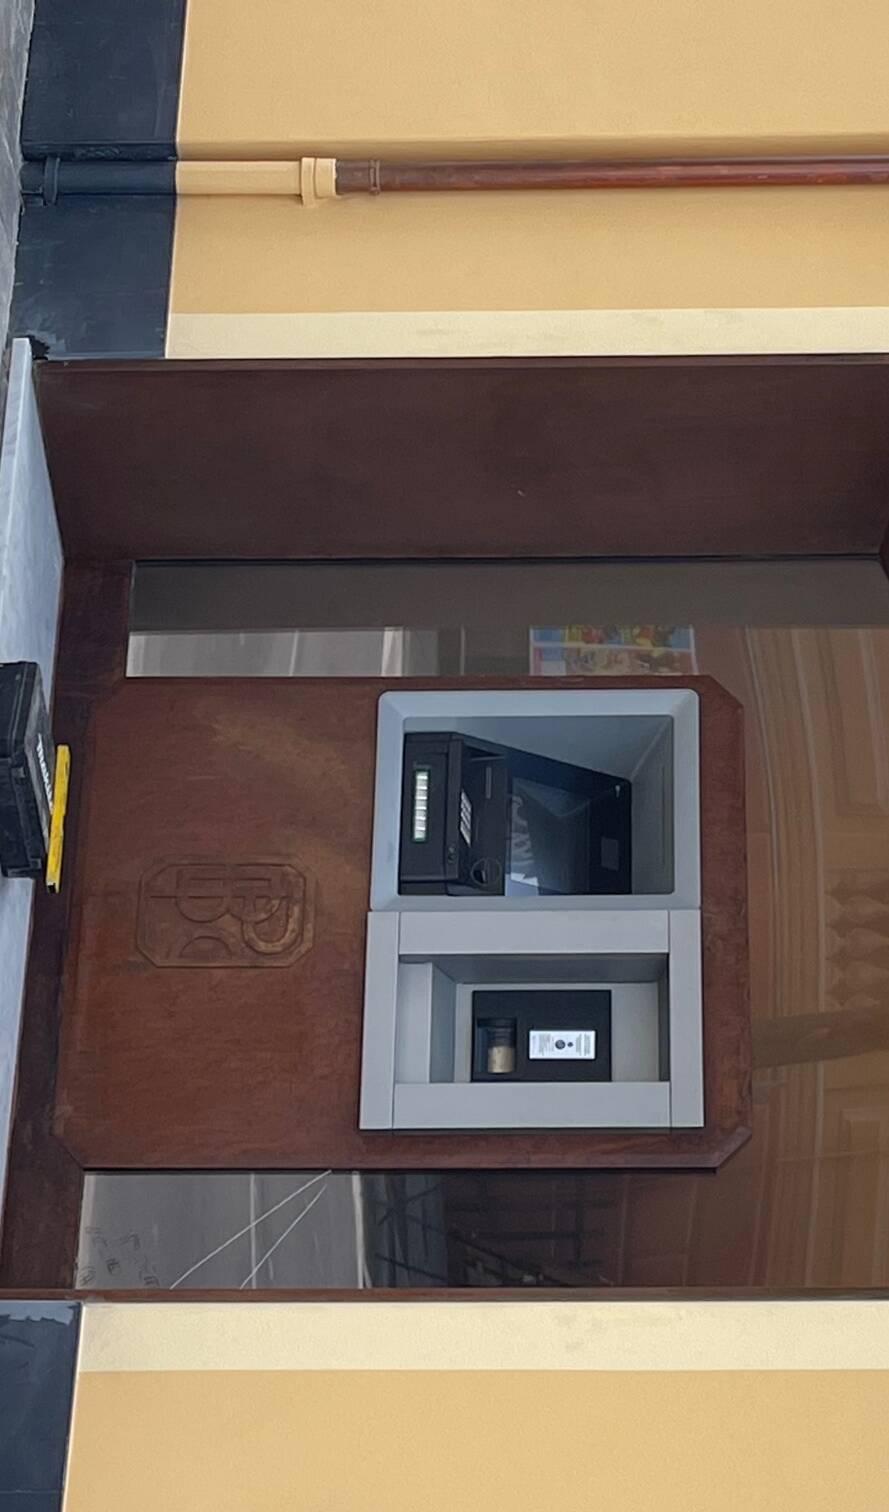 nuovo bancomat